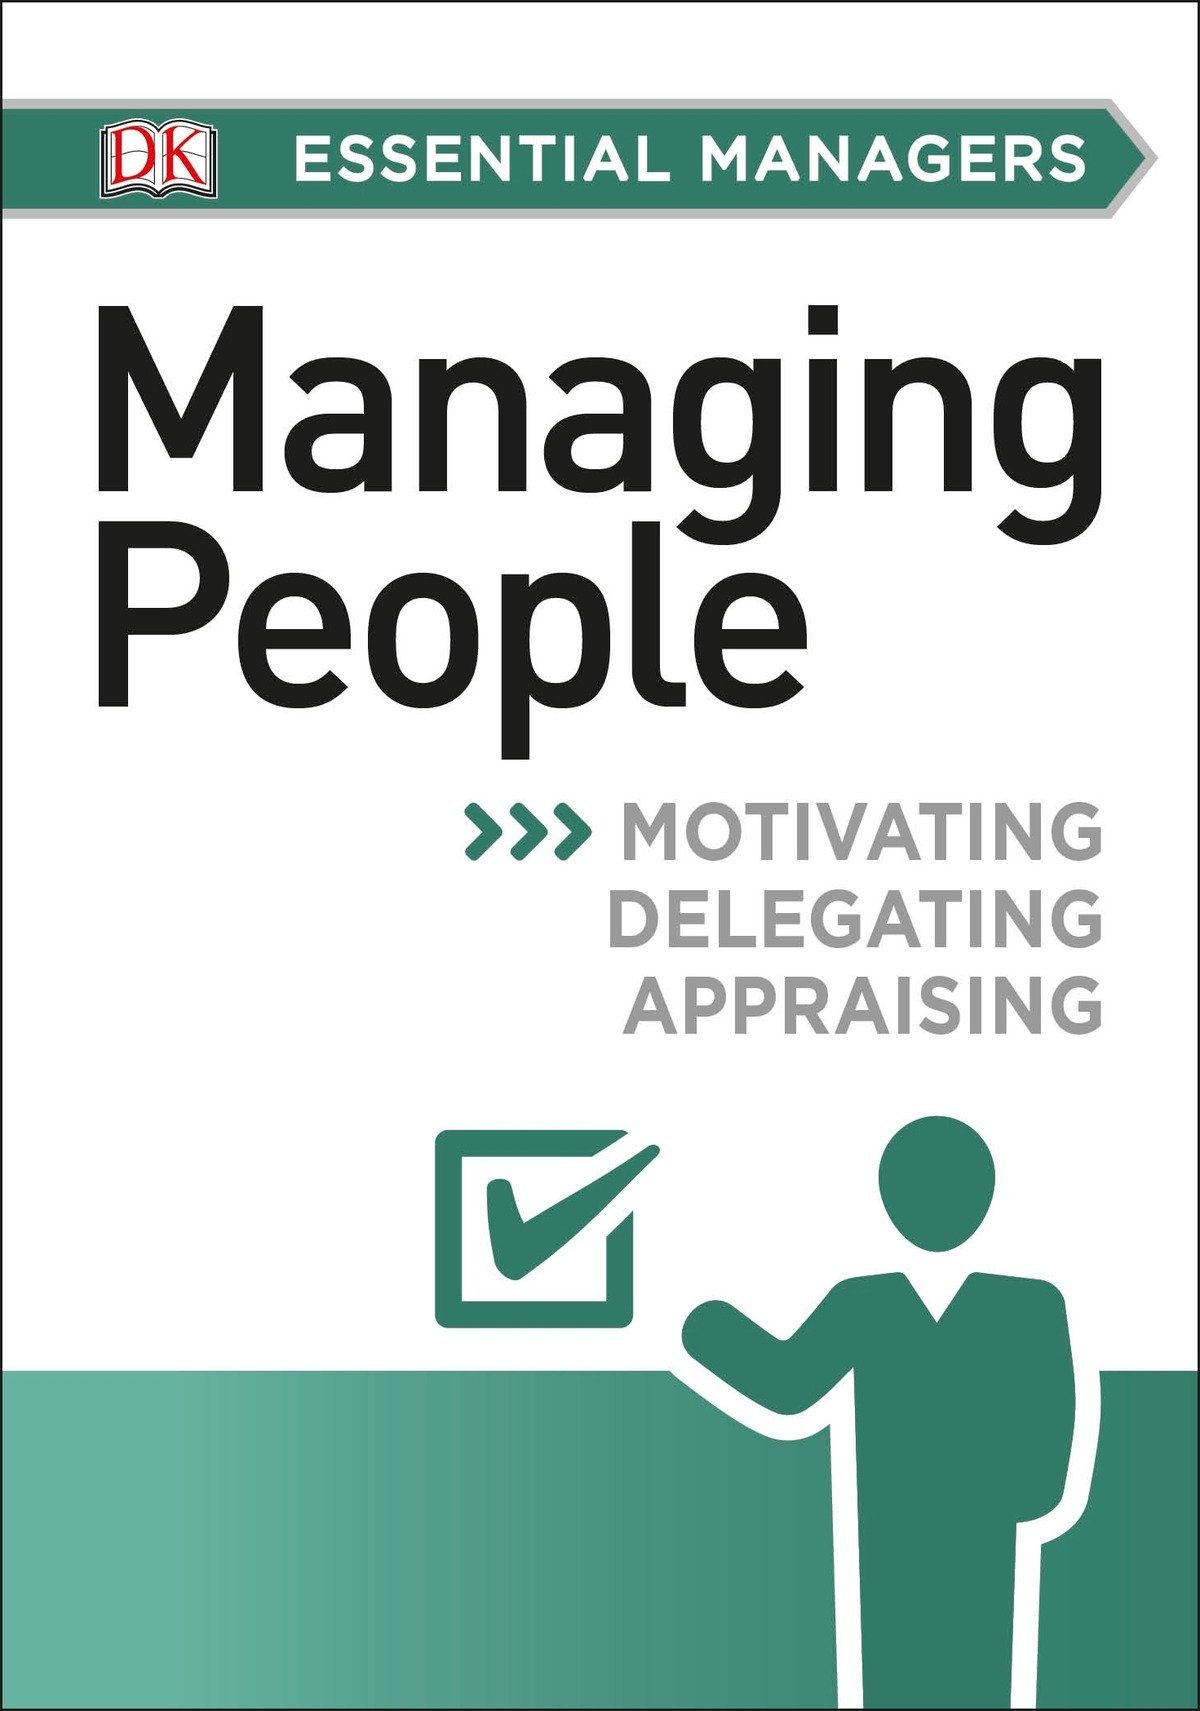 DK Essential Managers: Managing People: Johanna Hunsaker, Phillip Hunsaker:  0790778035433: Amazon.com: Books